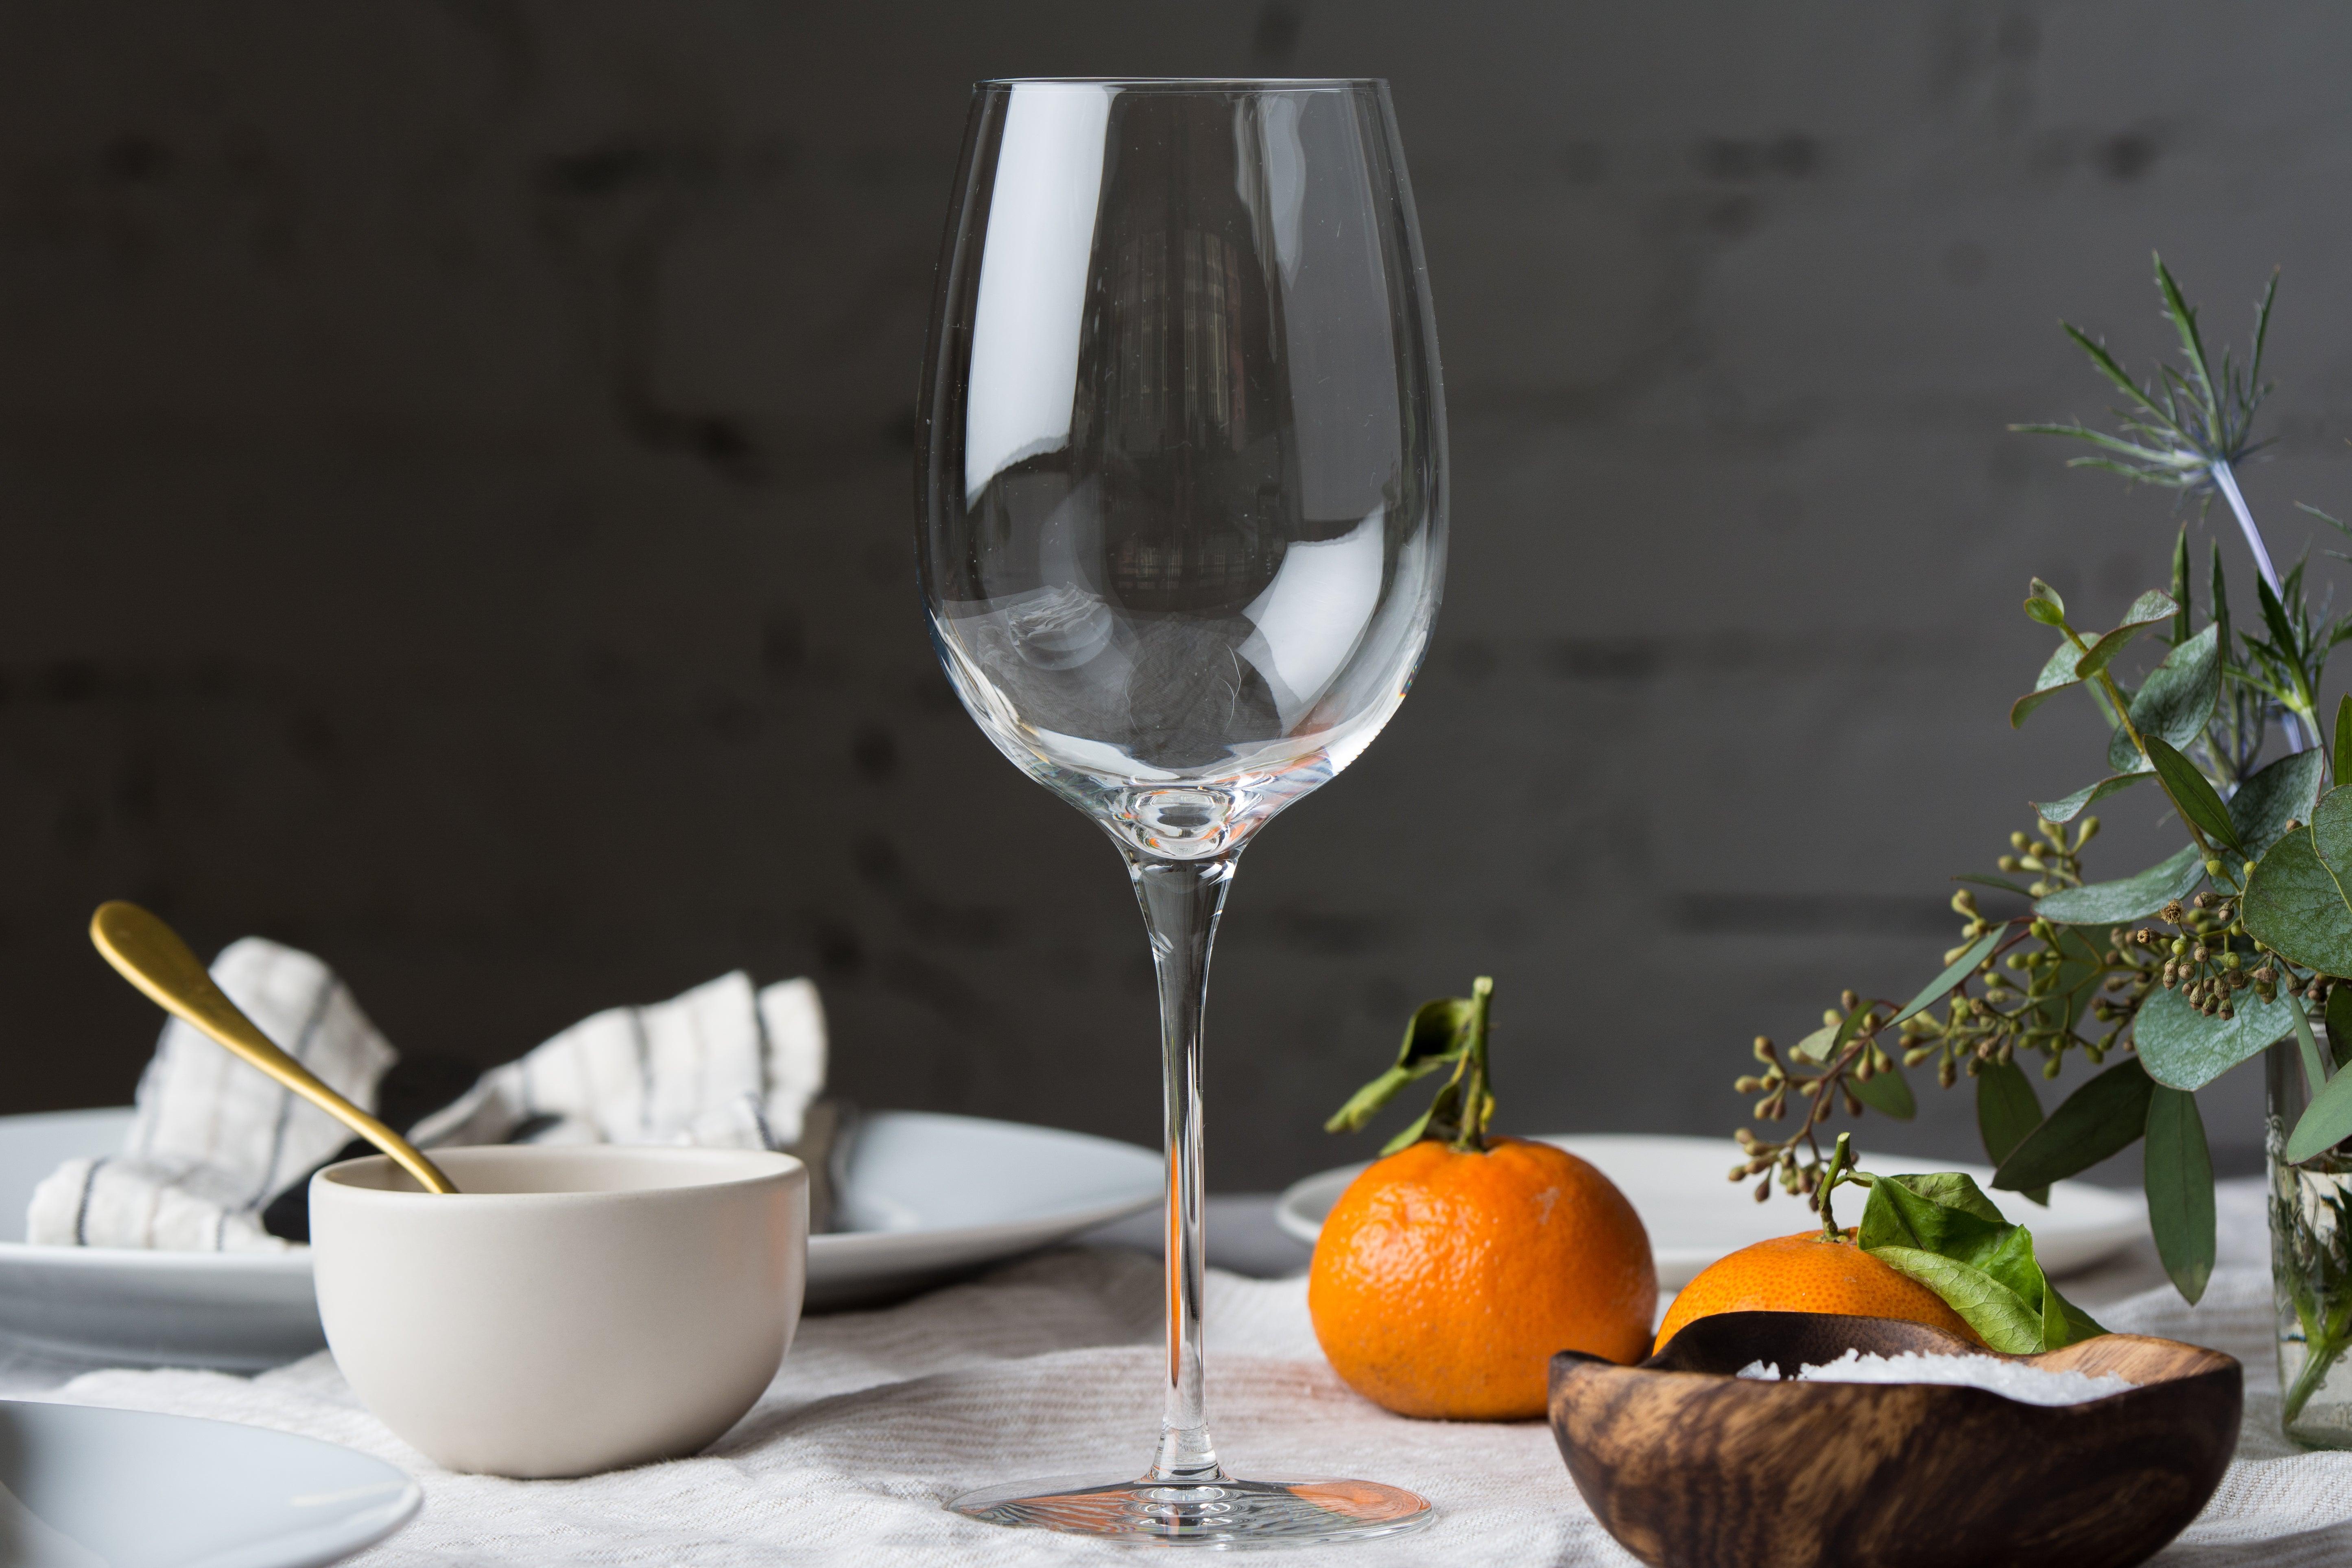 Libbey Signature Kentfield Estate All-Purpose Wine Glass on a set table